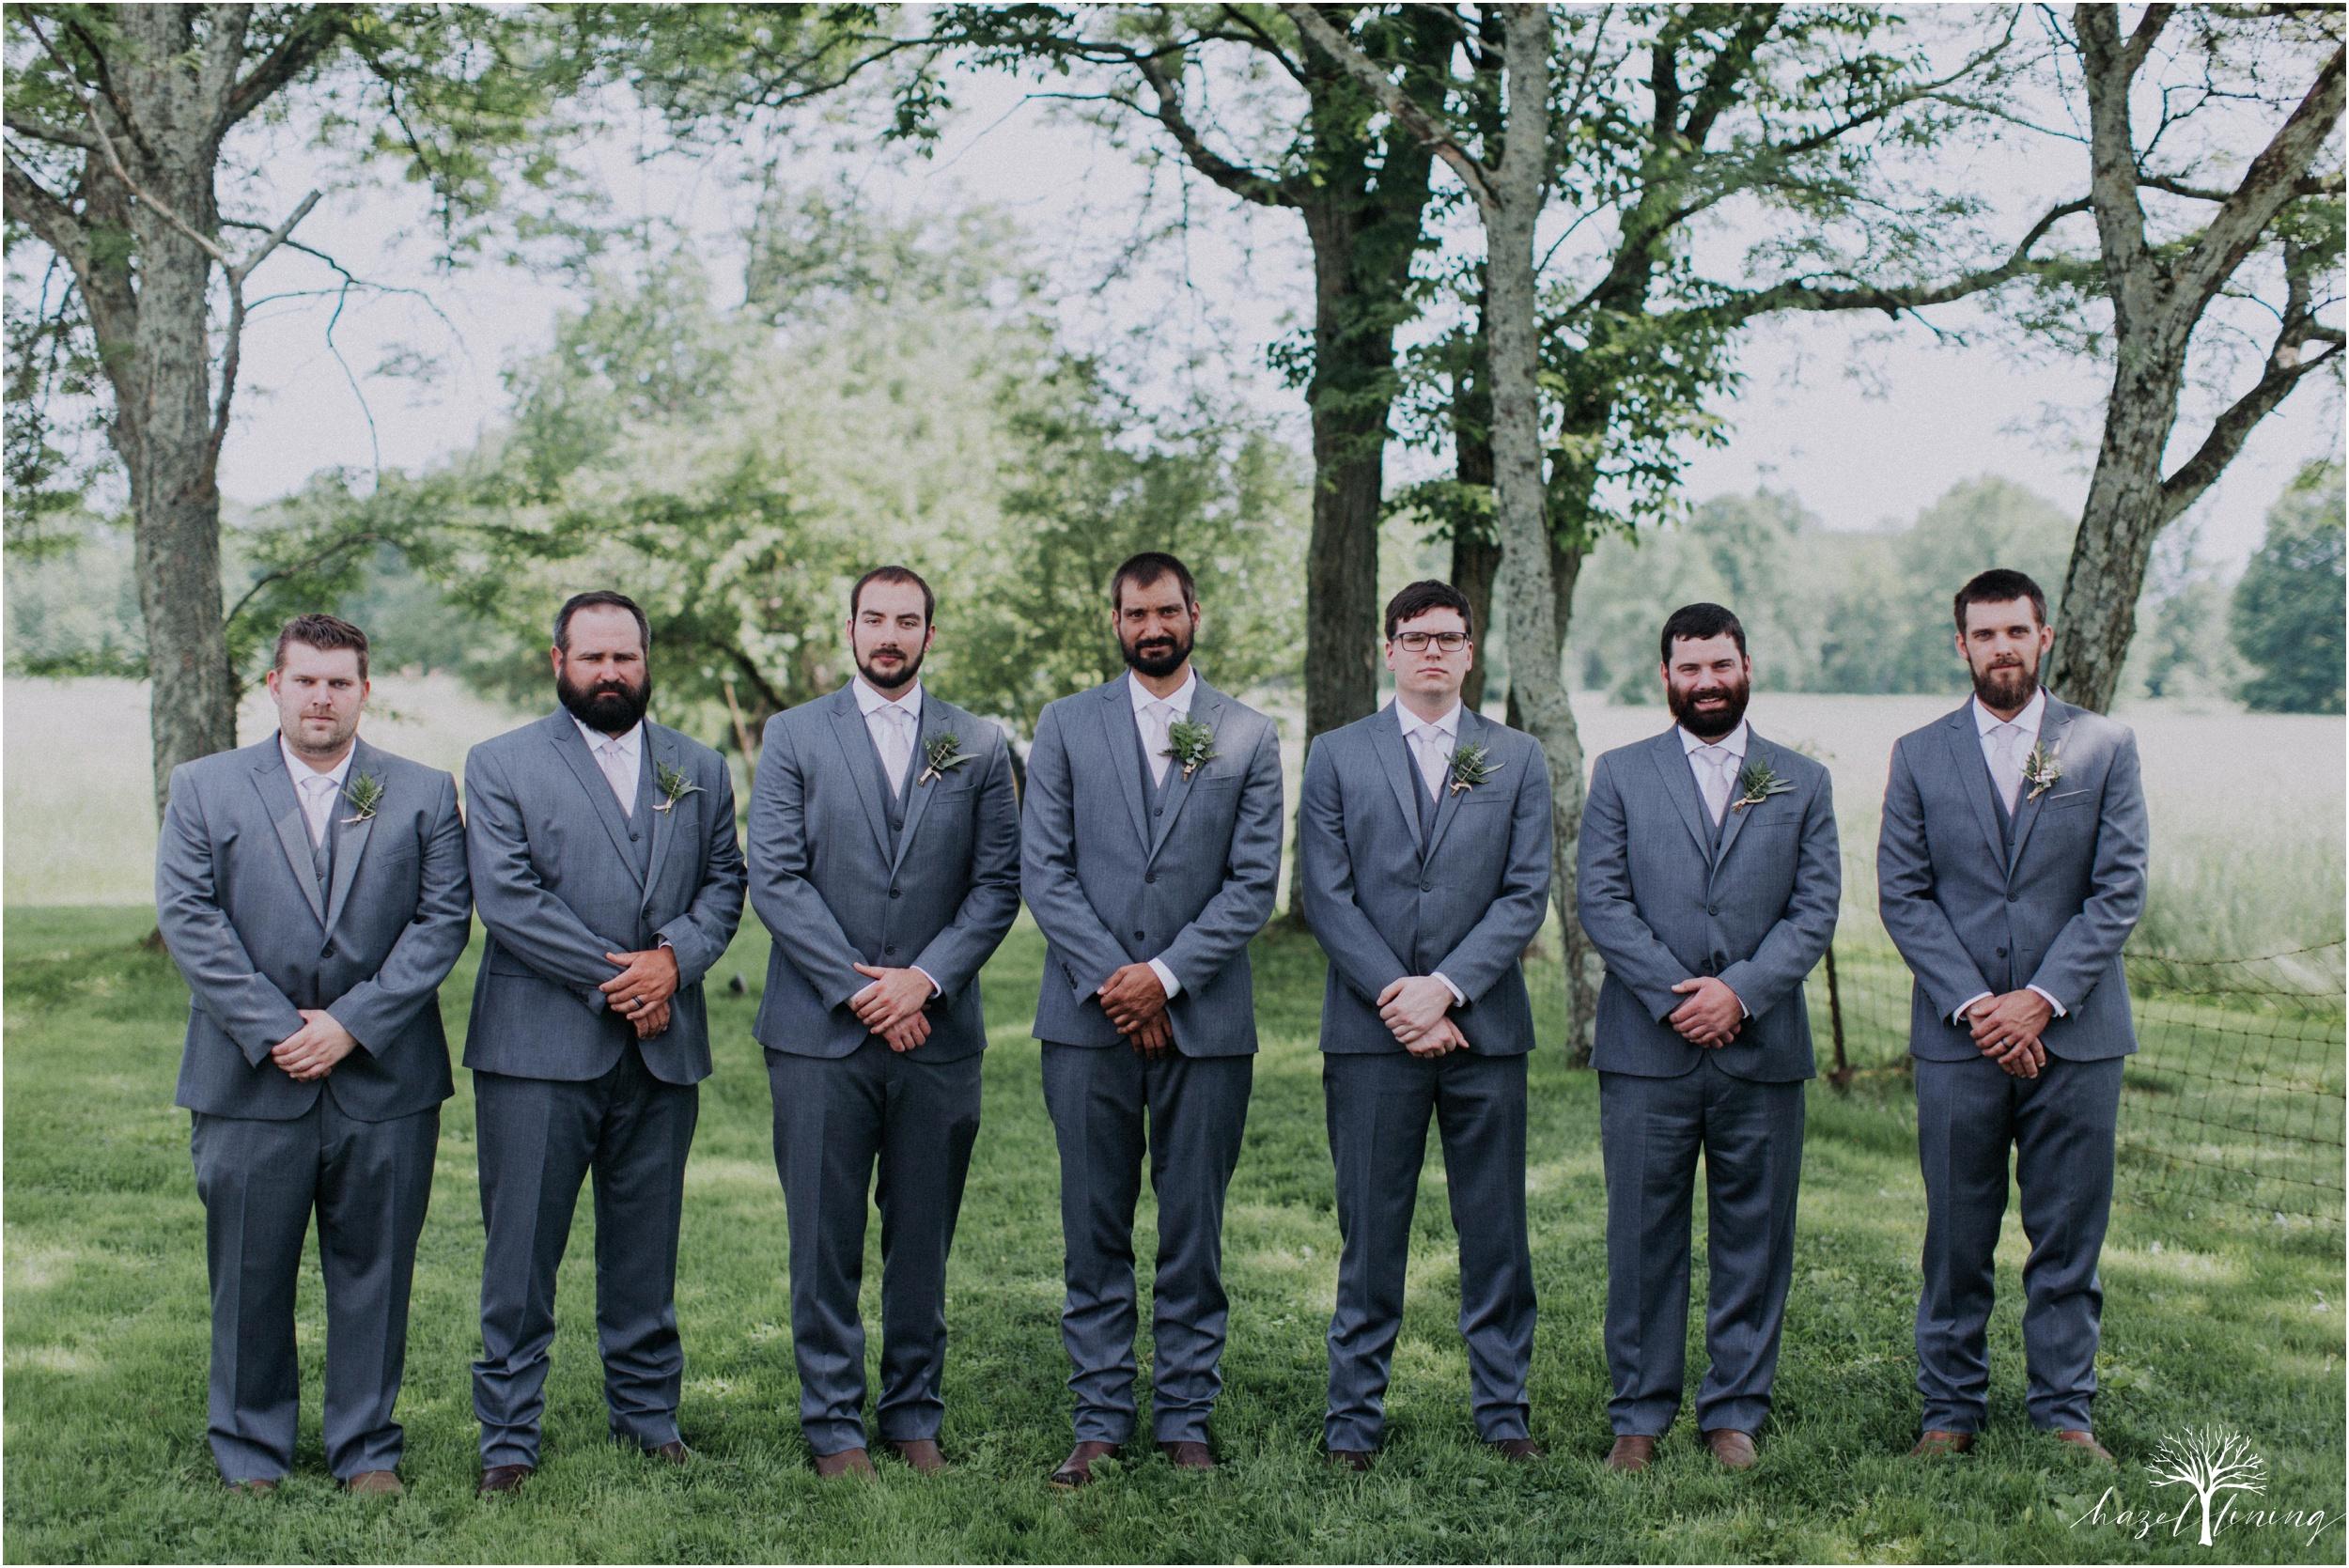 hazel-lining-travel-wedding-elopement-photography-lisa-landon-shoemaker-the-farm-bakery-and-events-bucks-county-quakertown-pennsylvania-summer-country-outdoor-farm-wedding_0040.jpg